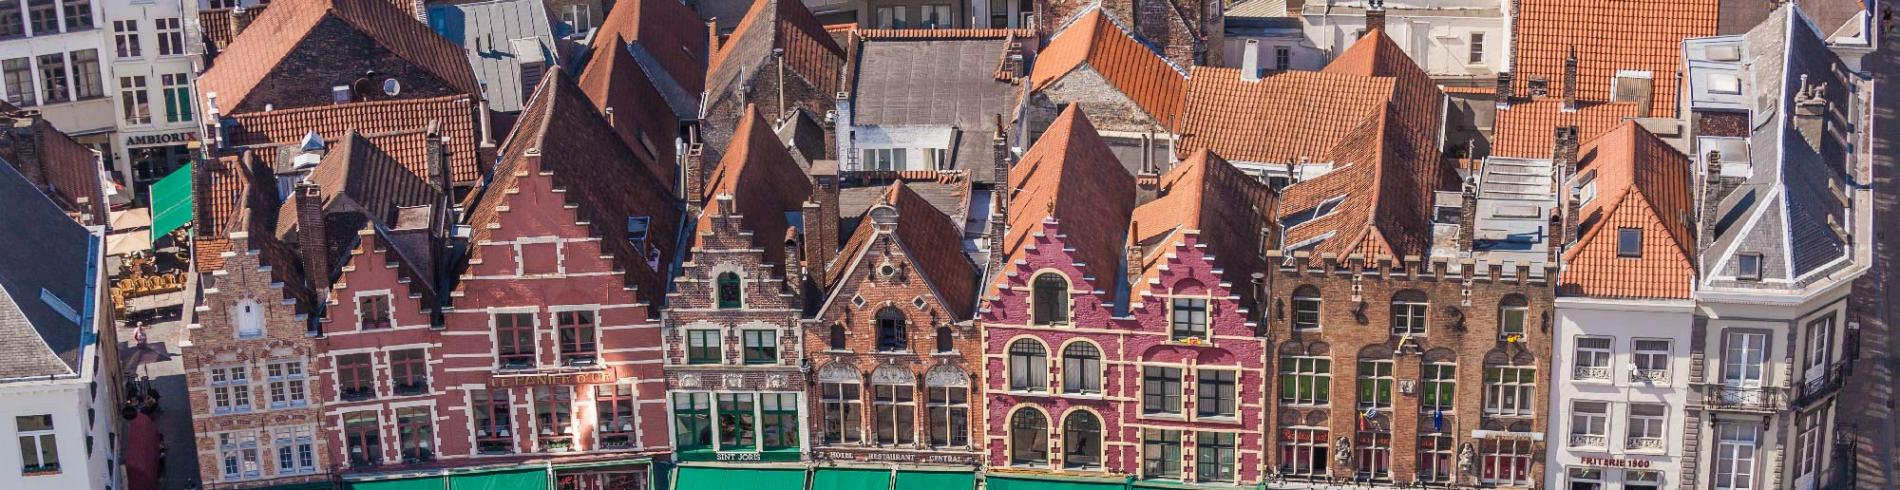 Bruges's historic city centre